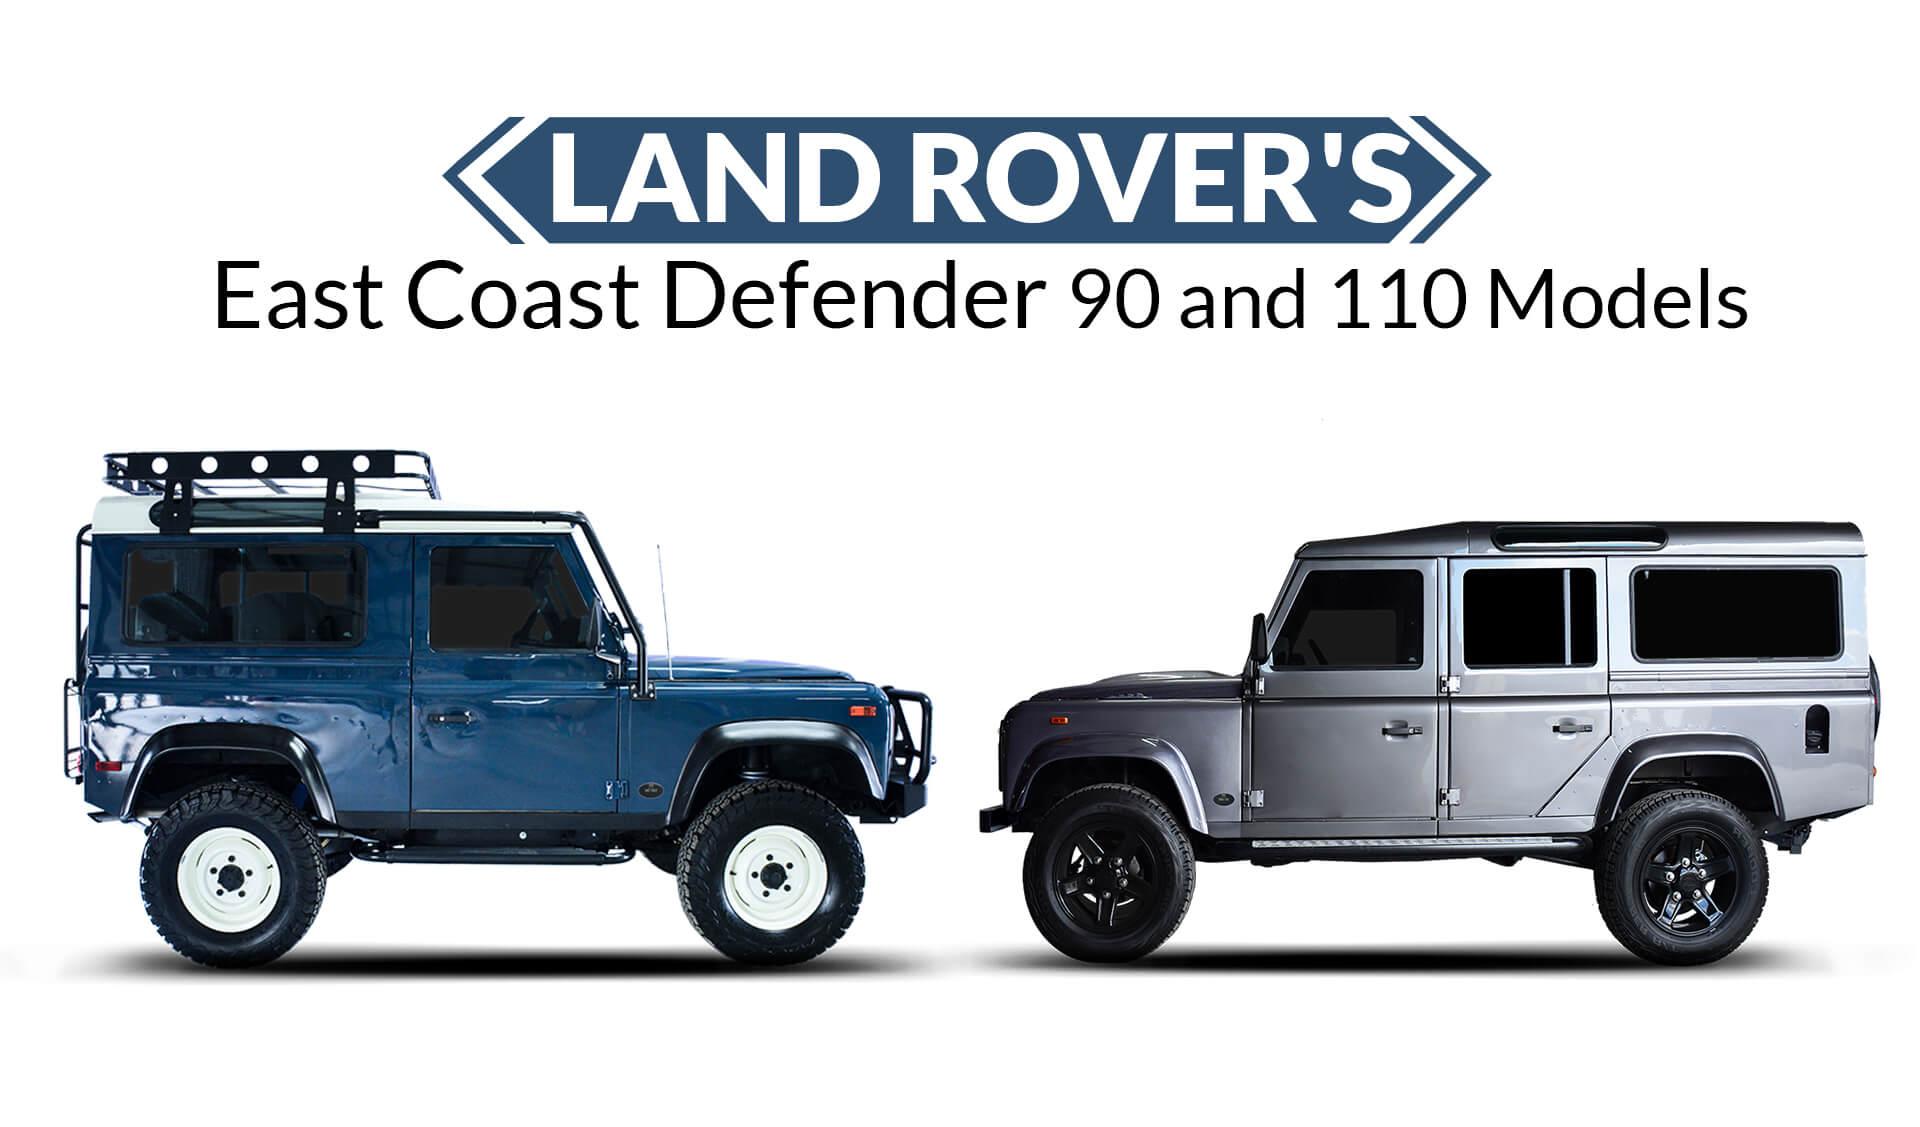 Land Rover s East Coast Defender 90 and 110 Models ebuddynews